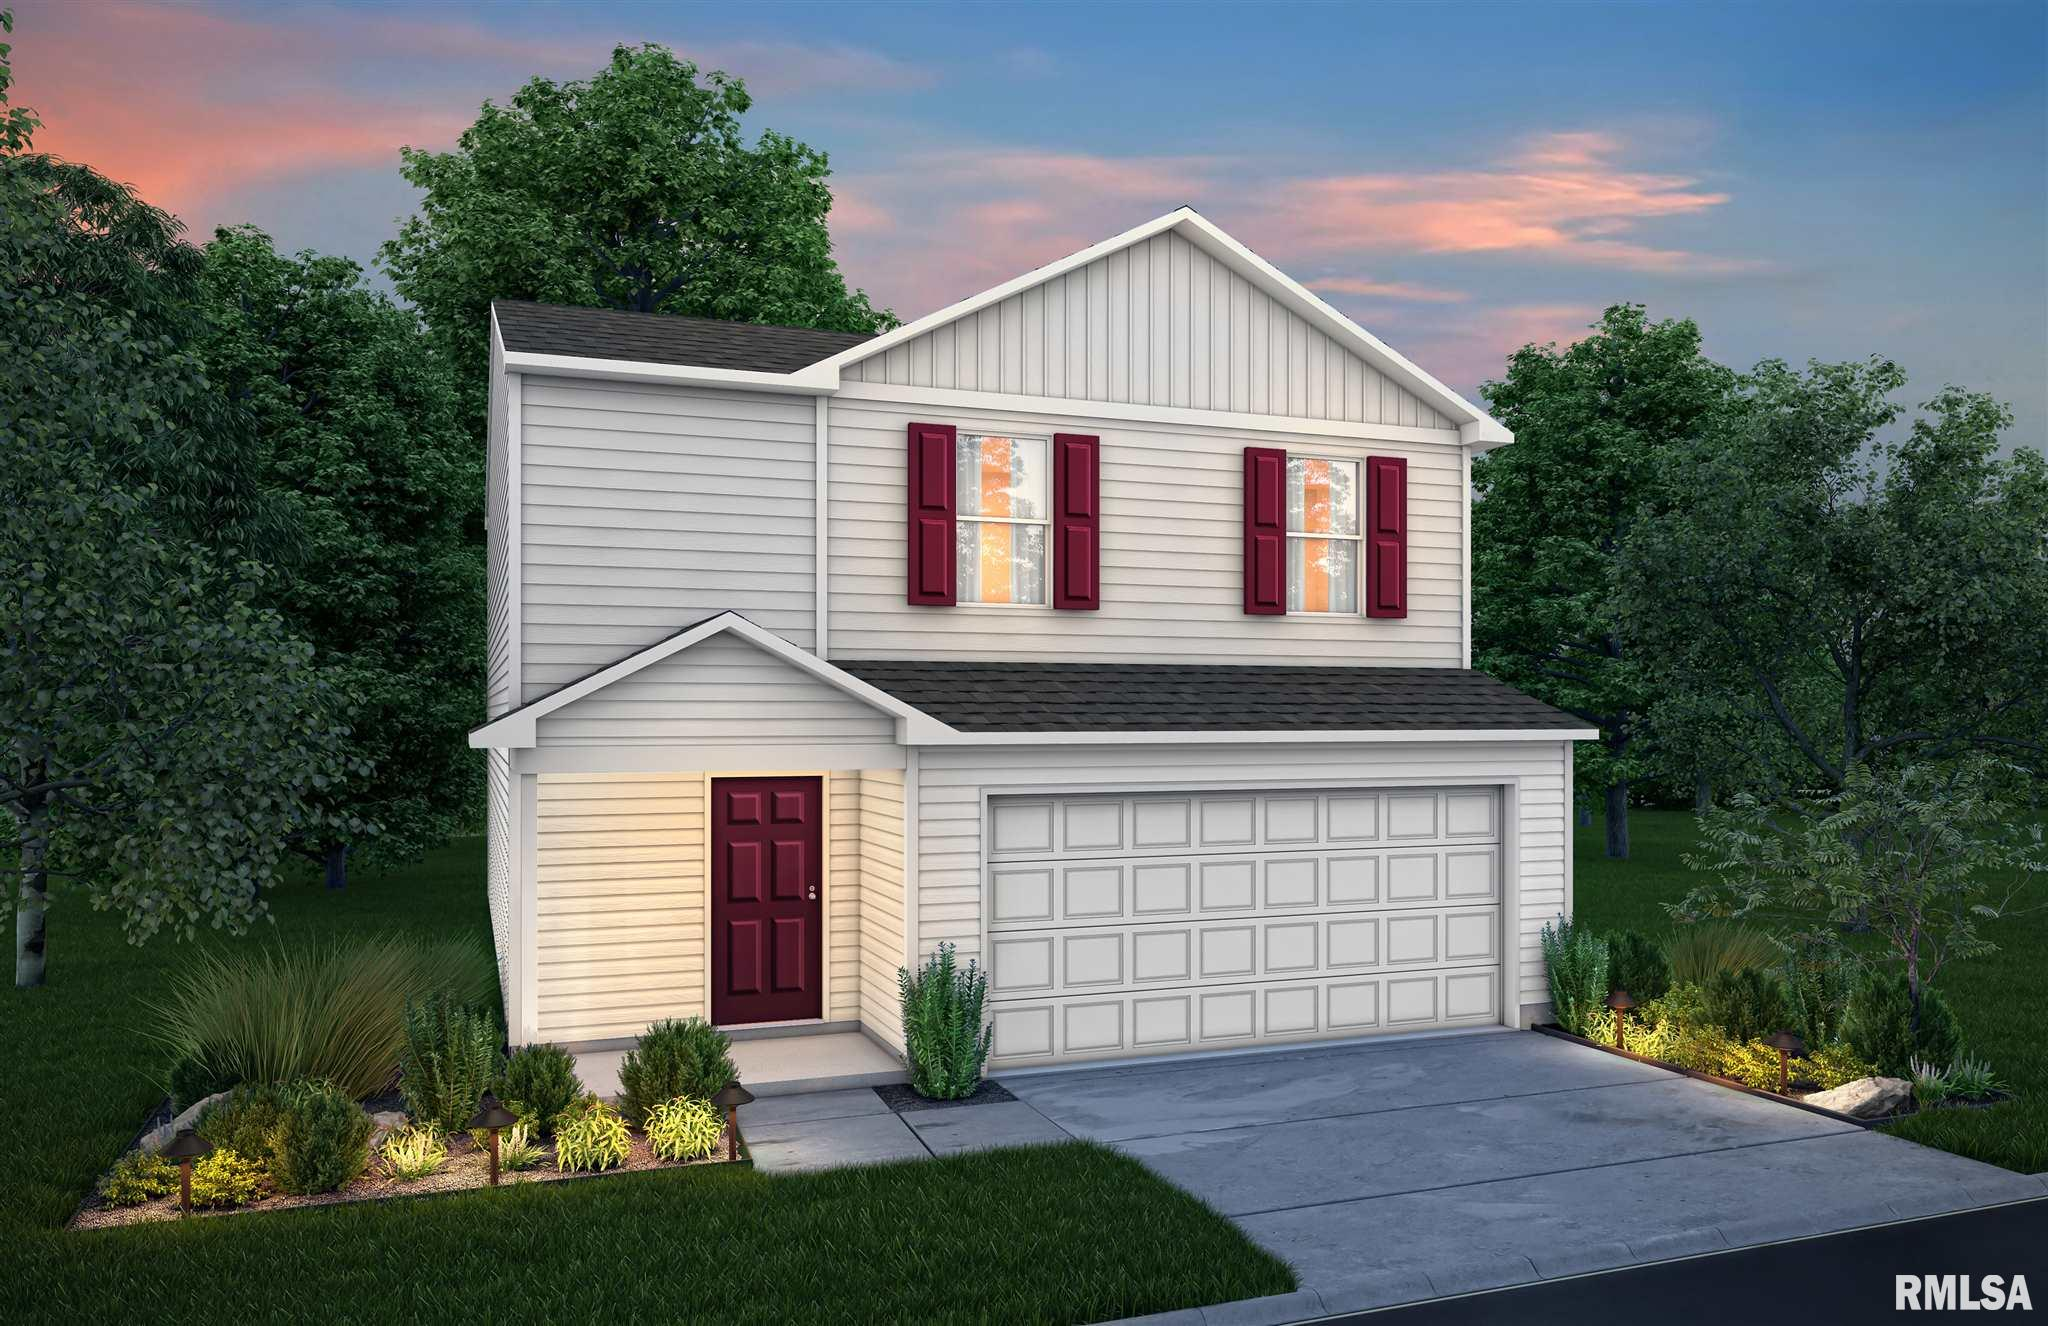 5213 SW DOSTAL Property Photo - Cedar Rapids, IA real estate listing